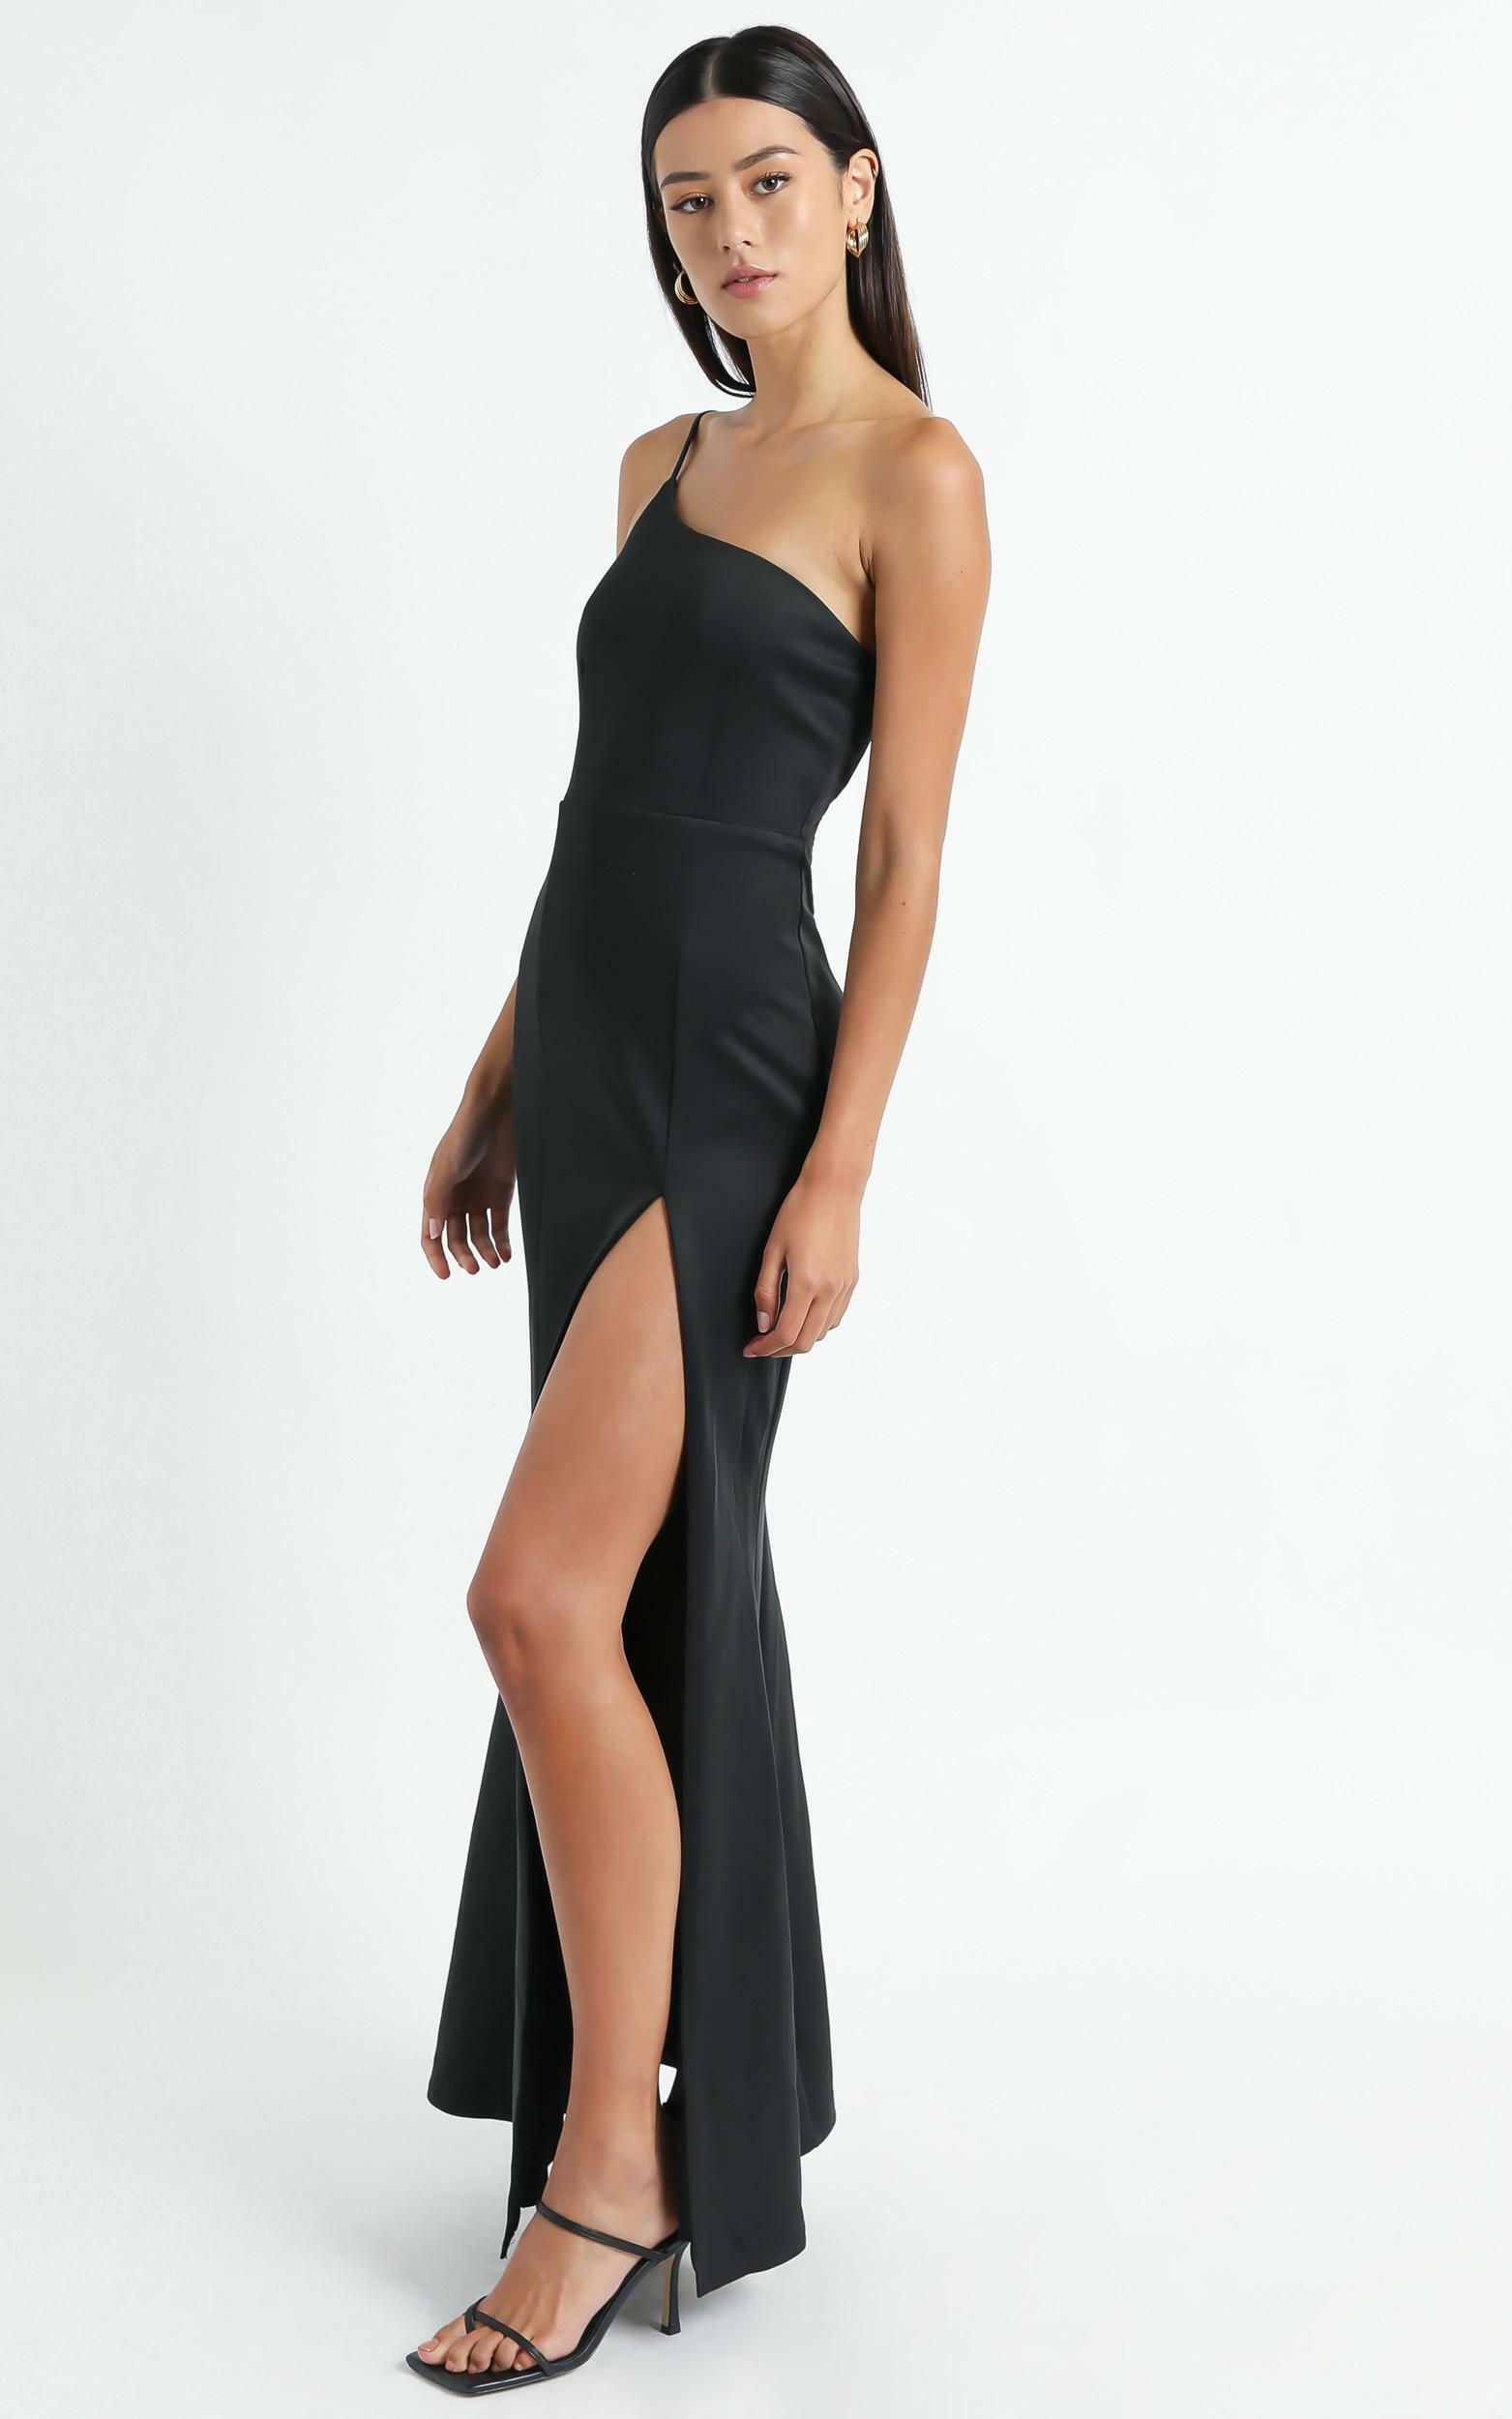 No Ones Fault Dress in Black - 4 (XXS), Black, hi-res image number null